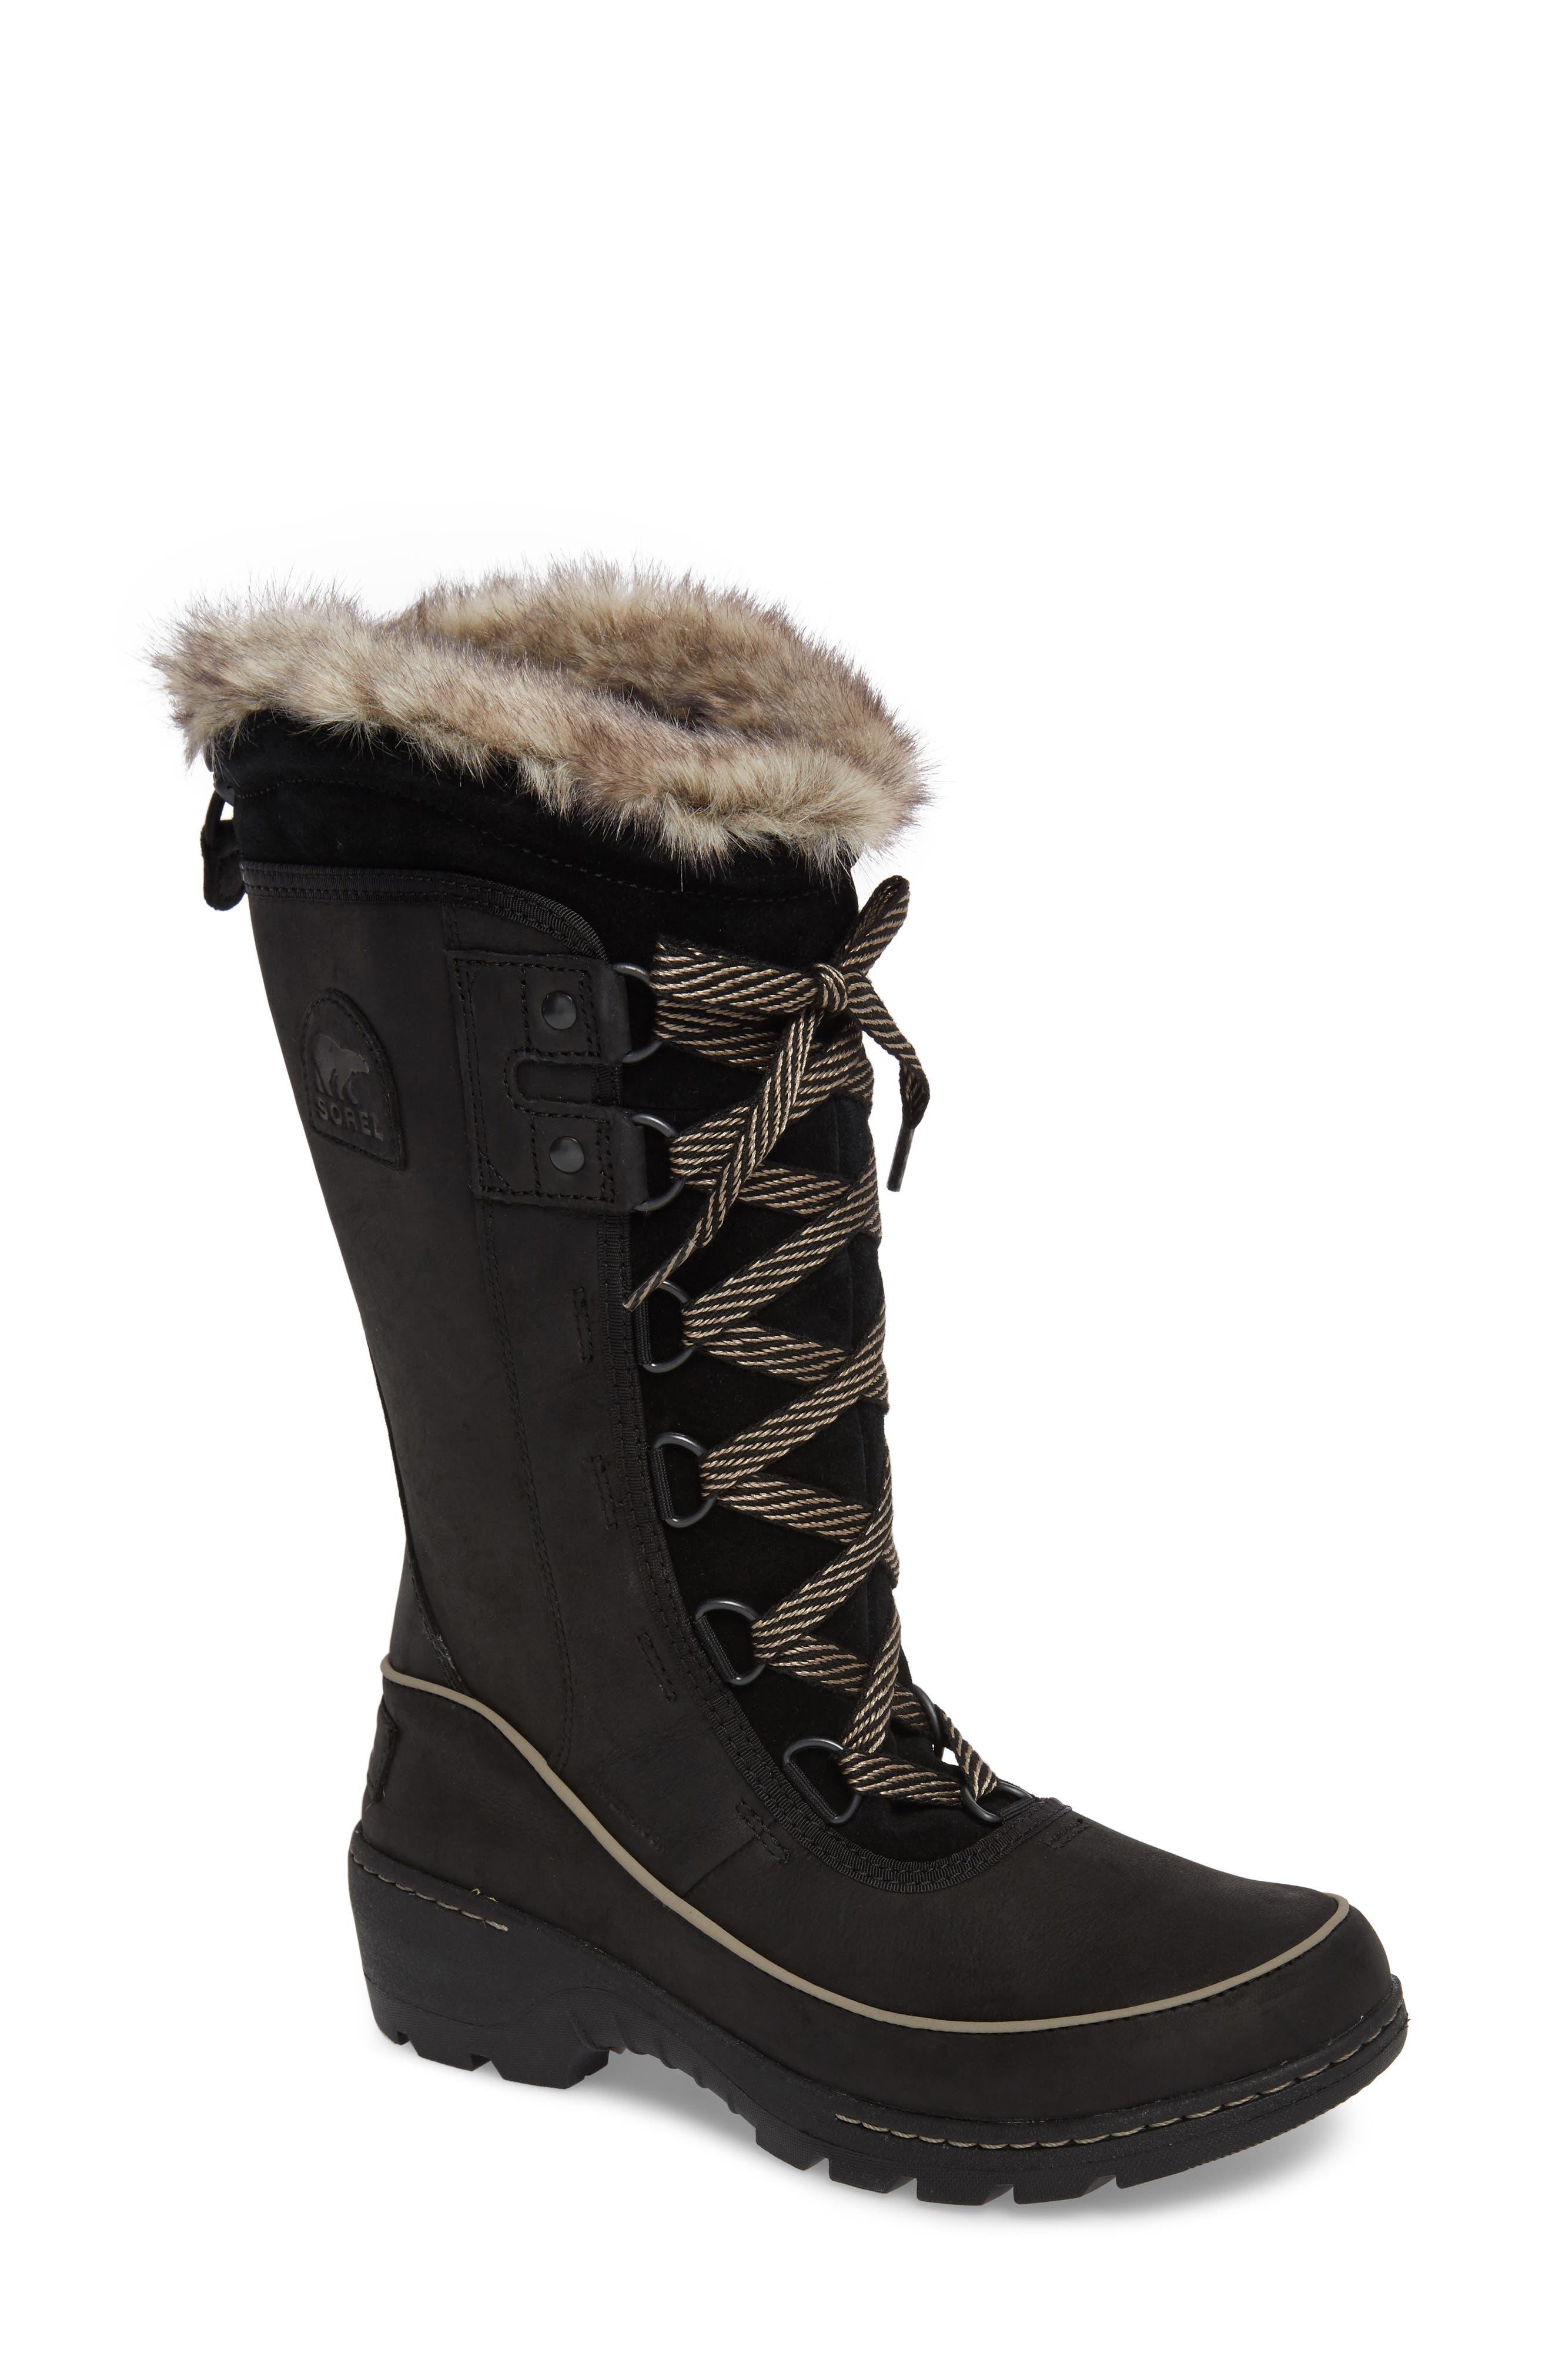 Tivoli II Insulated Winter Boot with Faux Fur Trim,                             Main thumbnail 1, color,                             010